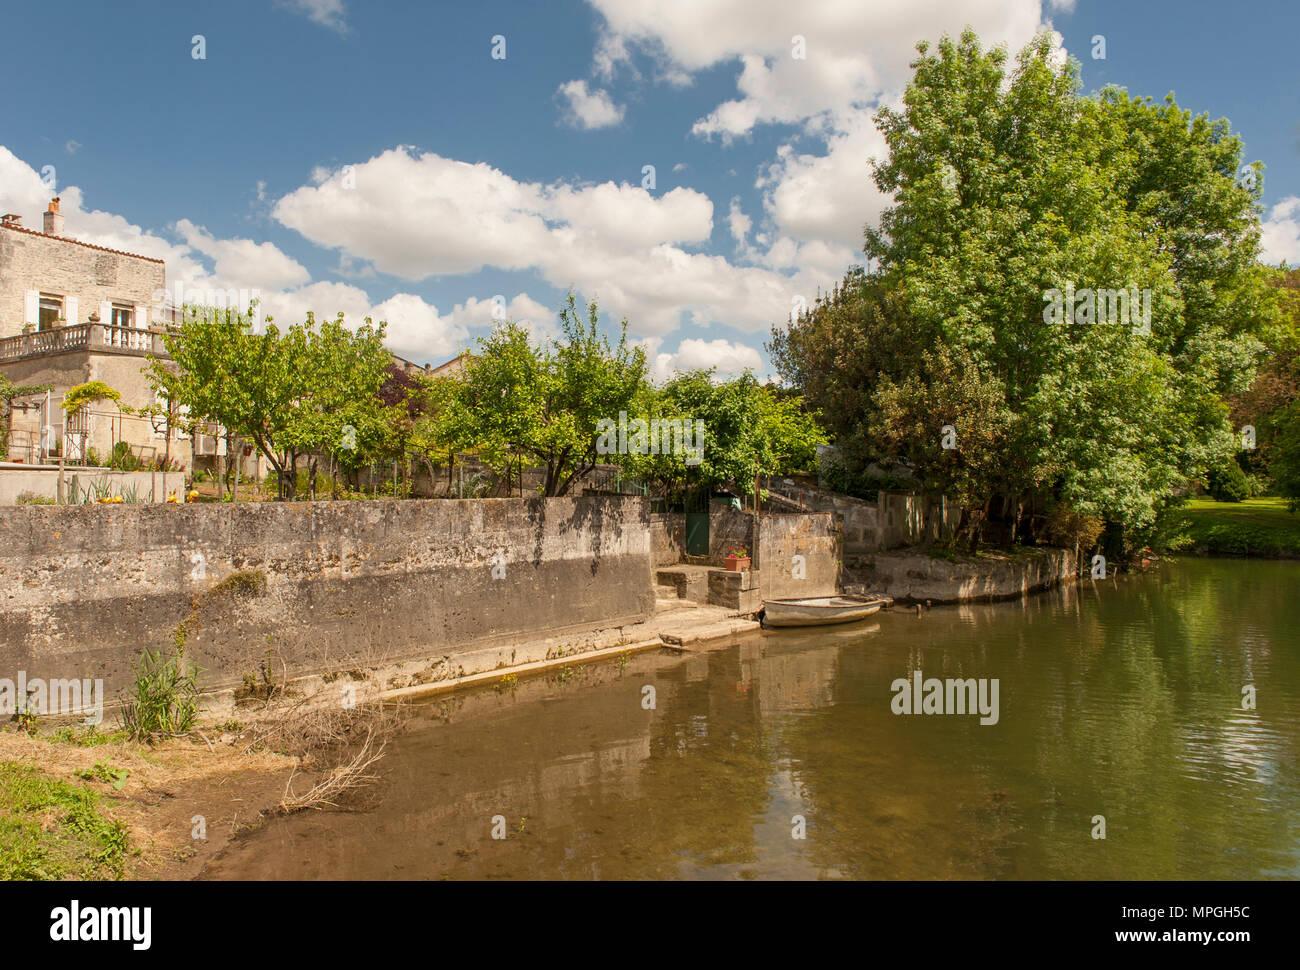 waterfront villa at Saint-Simon, France - Stock Image